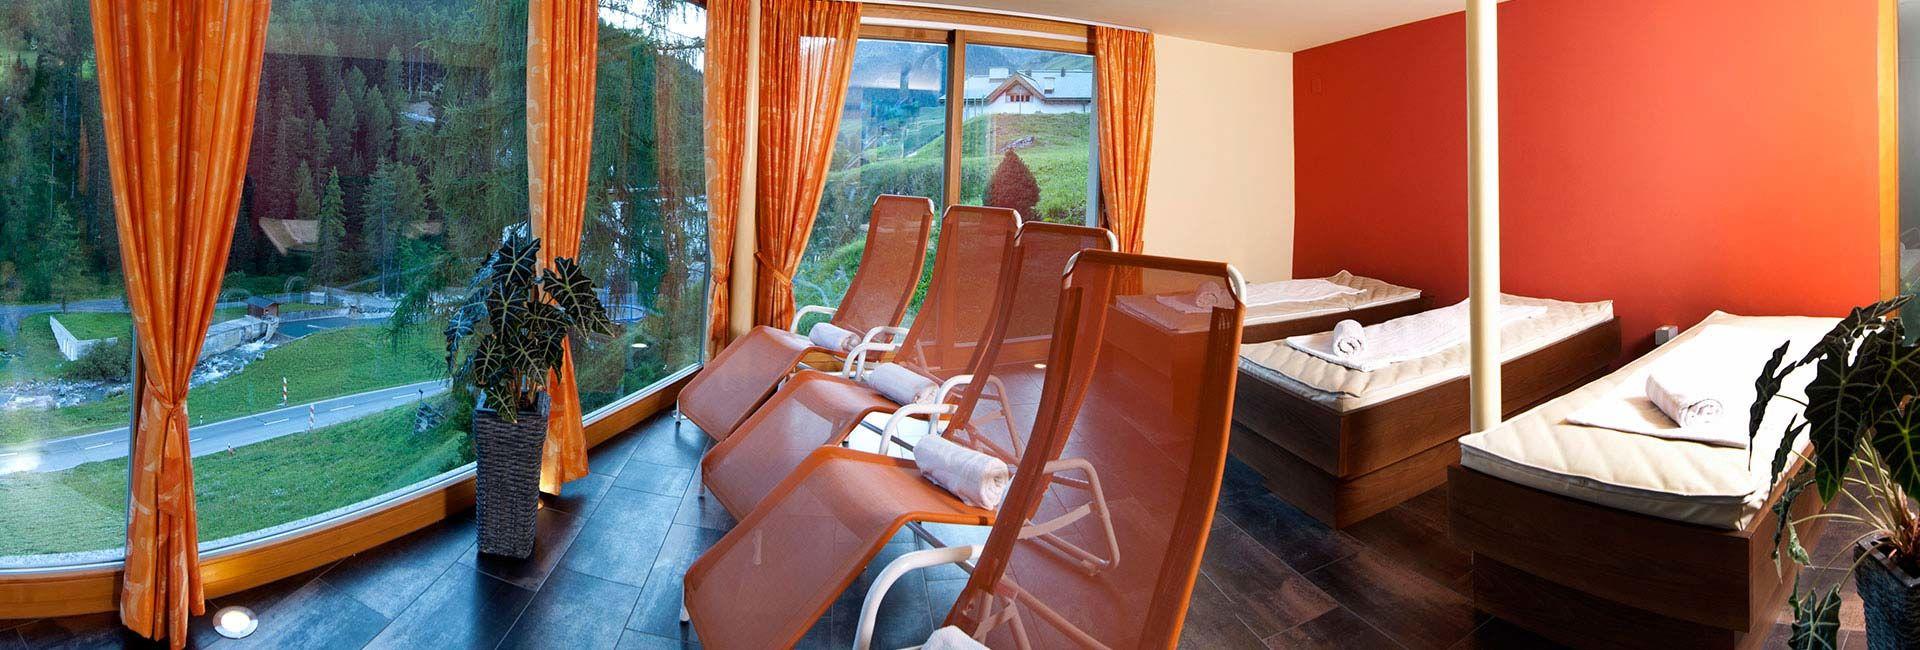 Samnaun Wellness im Hotel Romantica